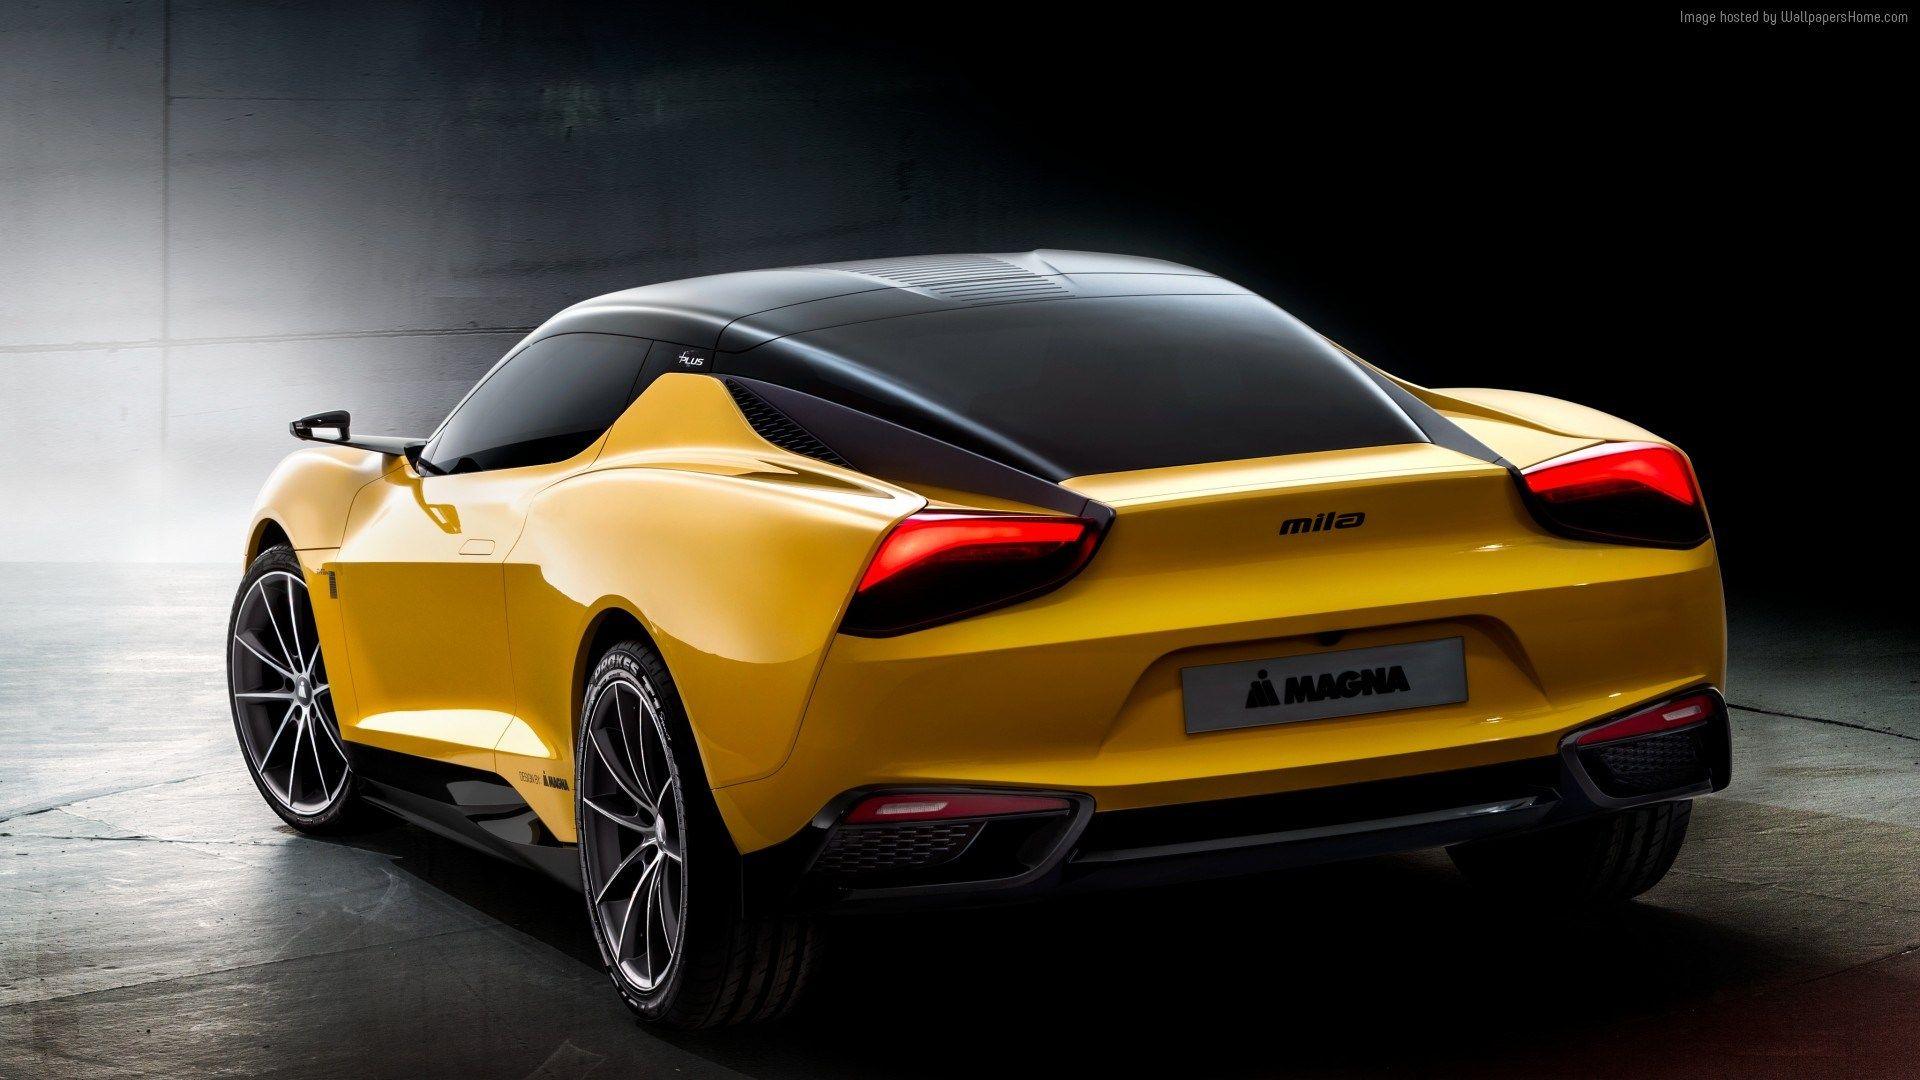 magna steyr mila plus wallpaper Concept cars, Hybrid car